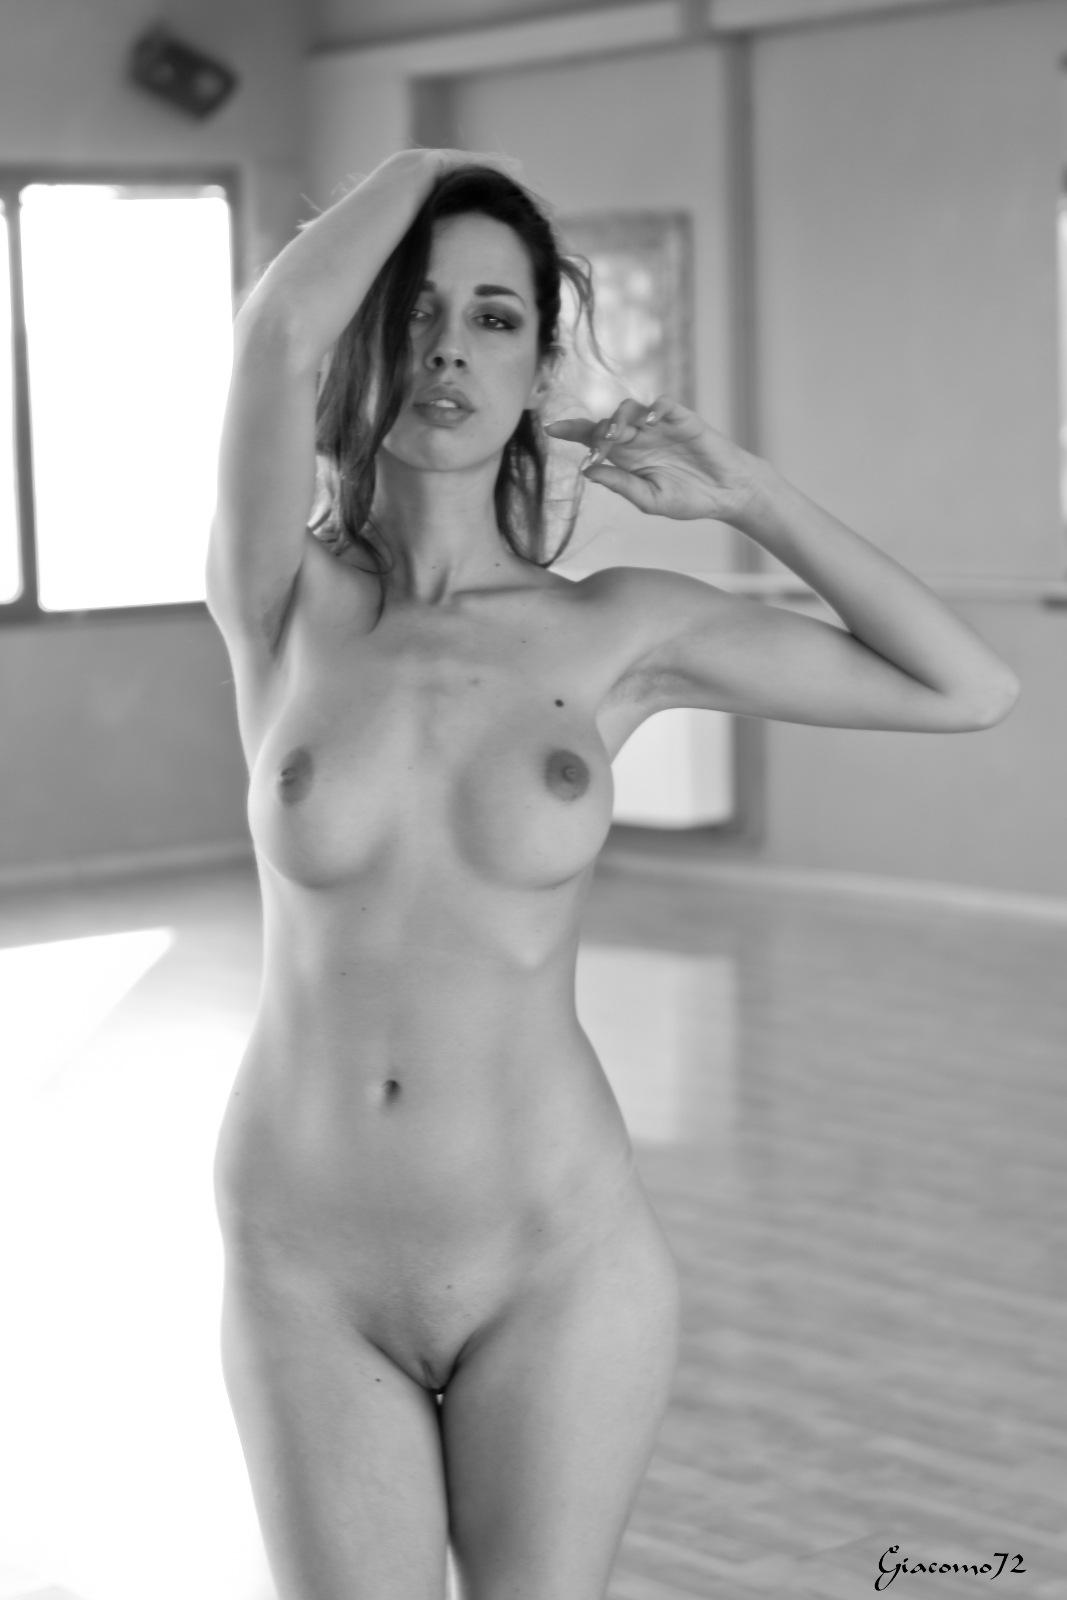 The Body by Giacomo72